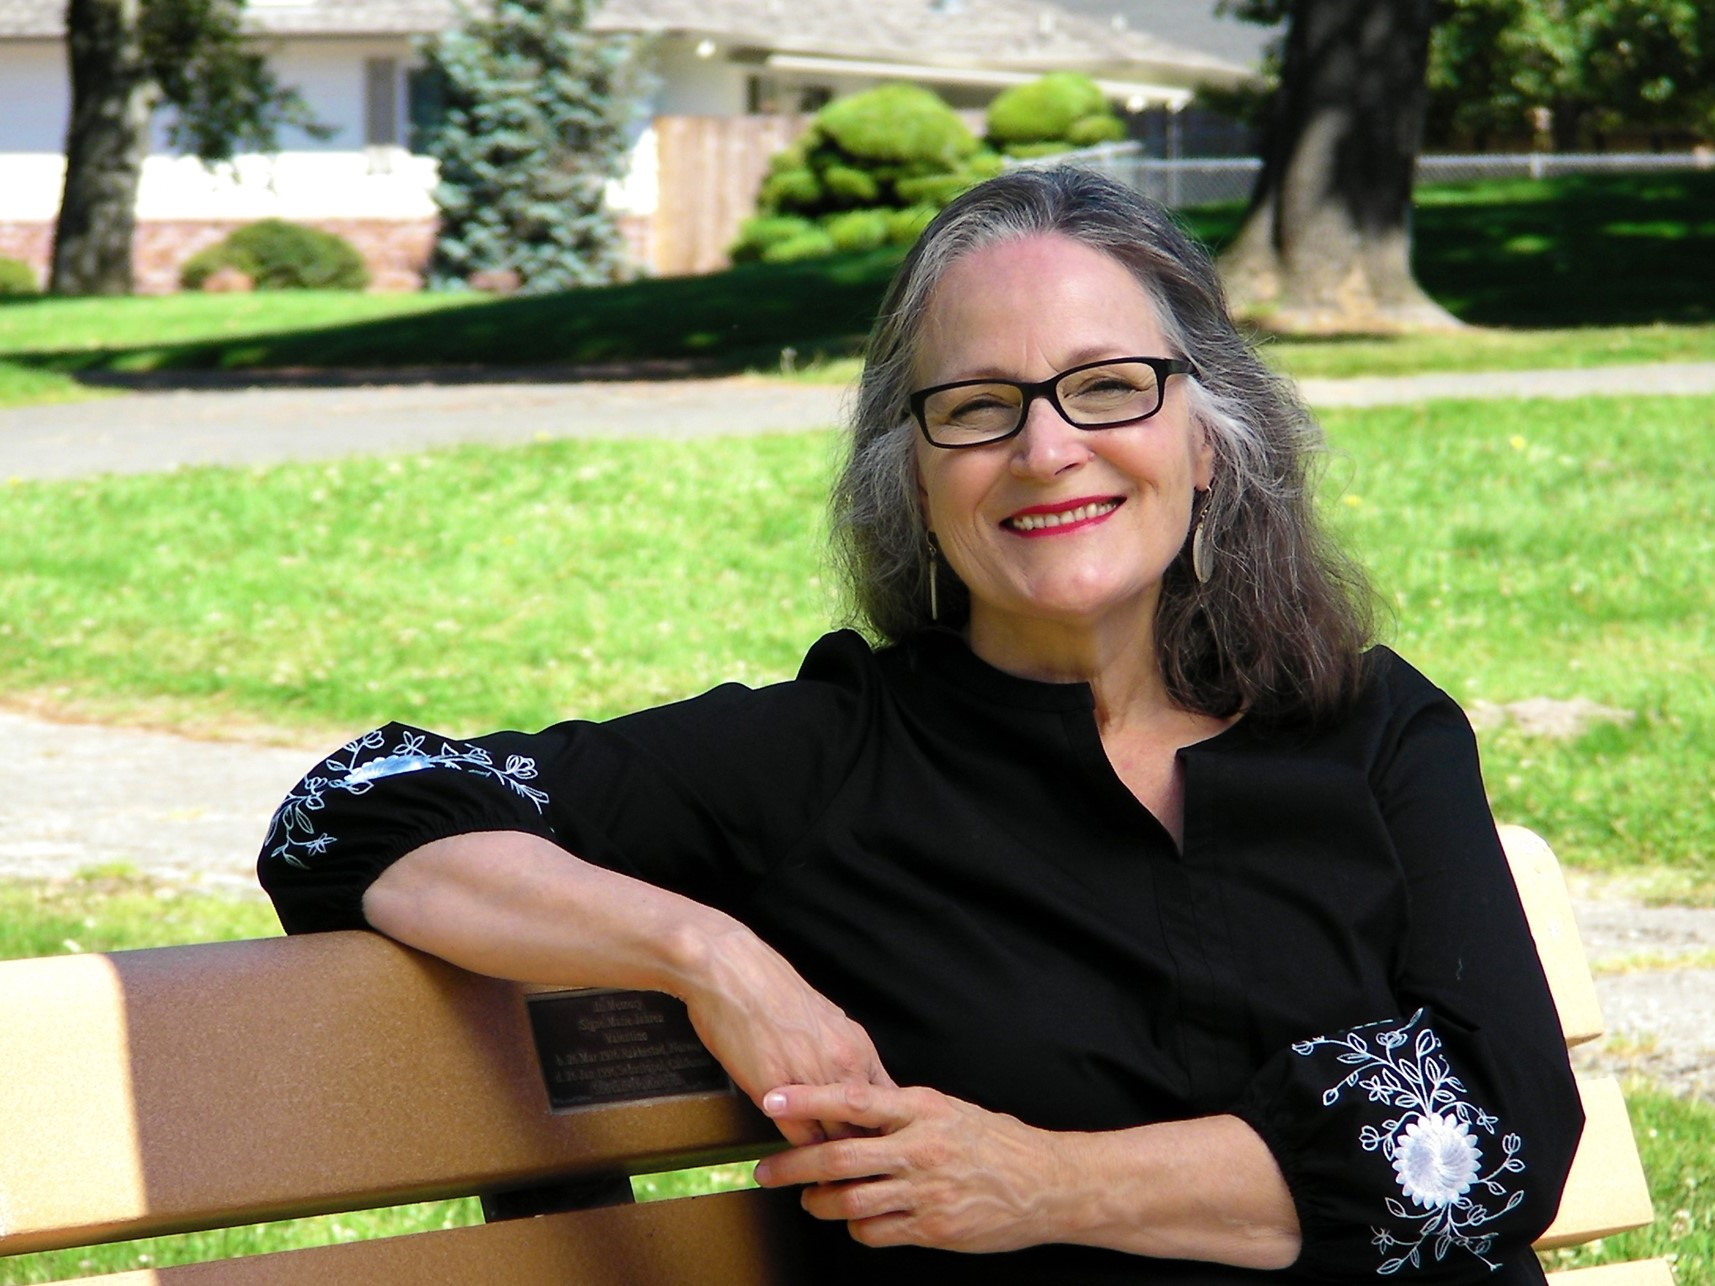 SANY0085 Joann on bench (2).jpg